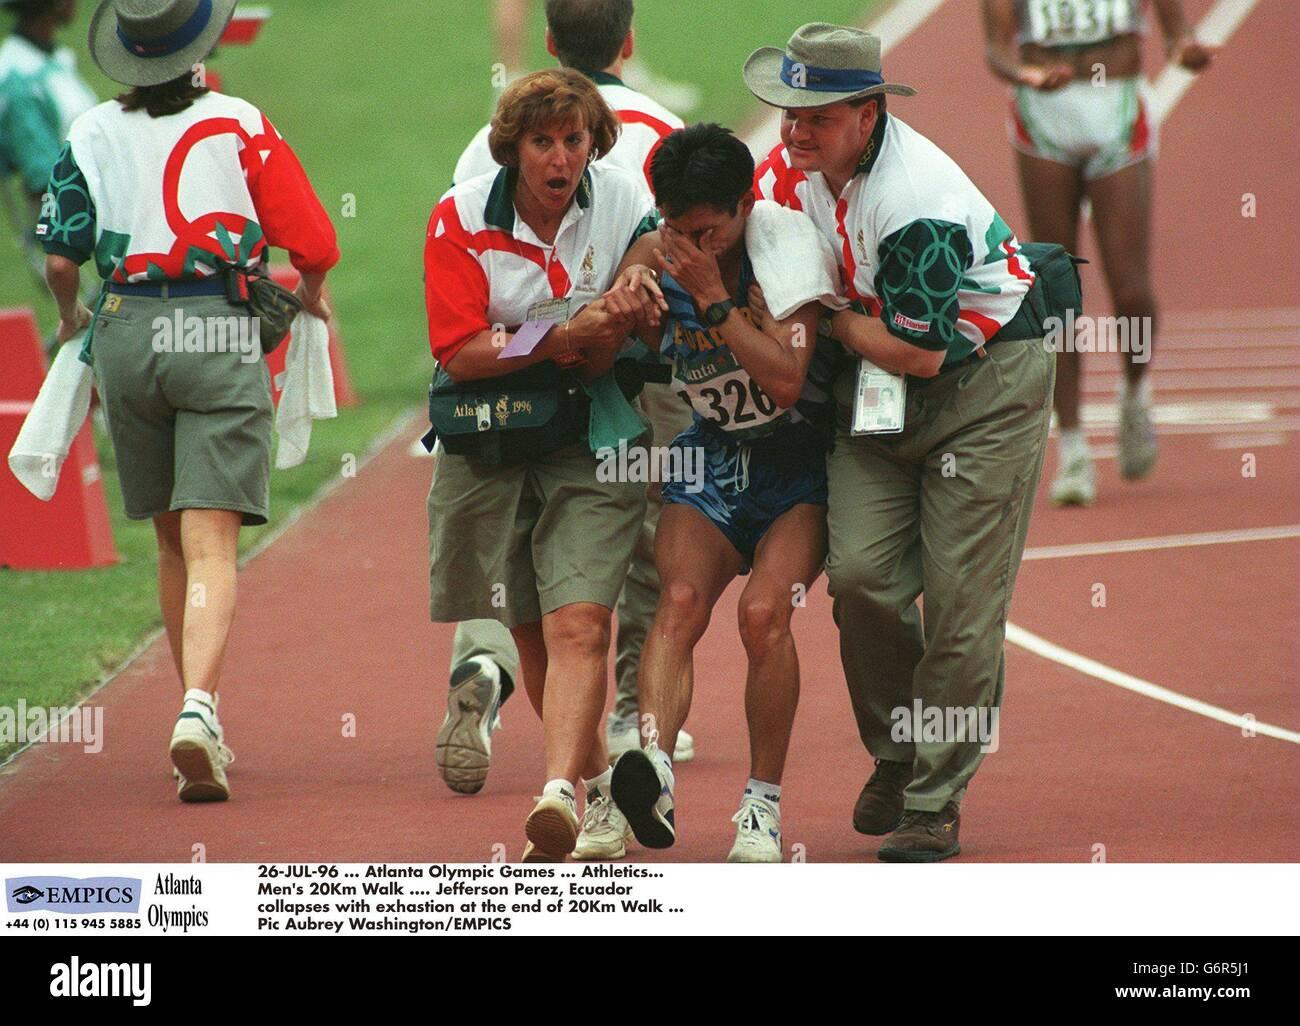 a4a9837758a68 26 Jul 96 Atlanta Olympic Games Athletics Mens 20km Walk Jefferson Perez  Stock Photos and Images